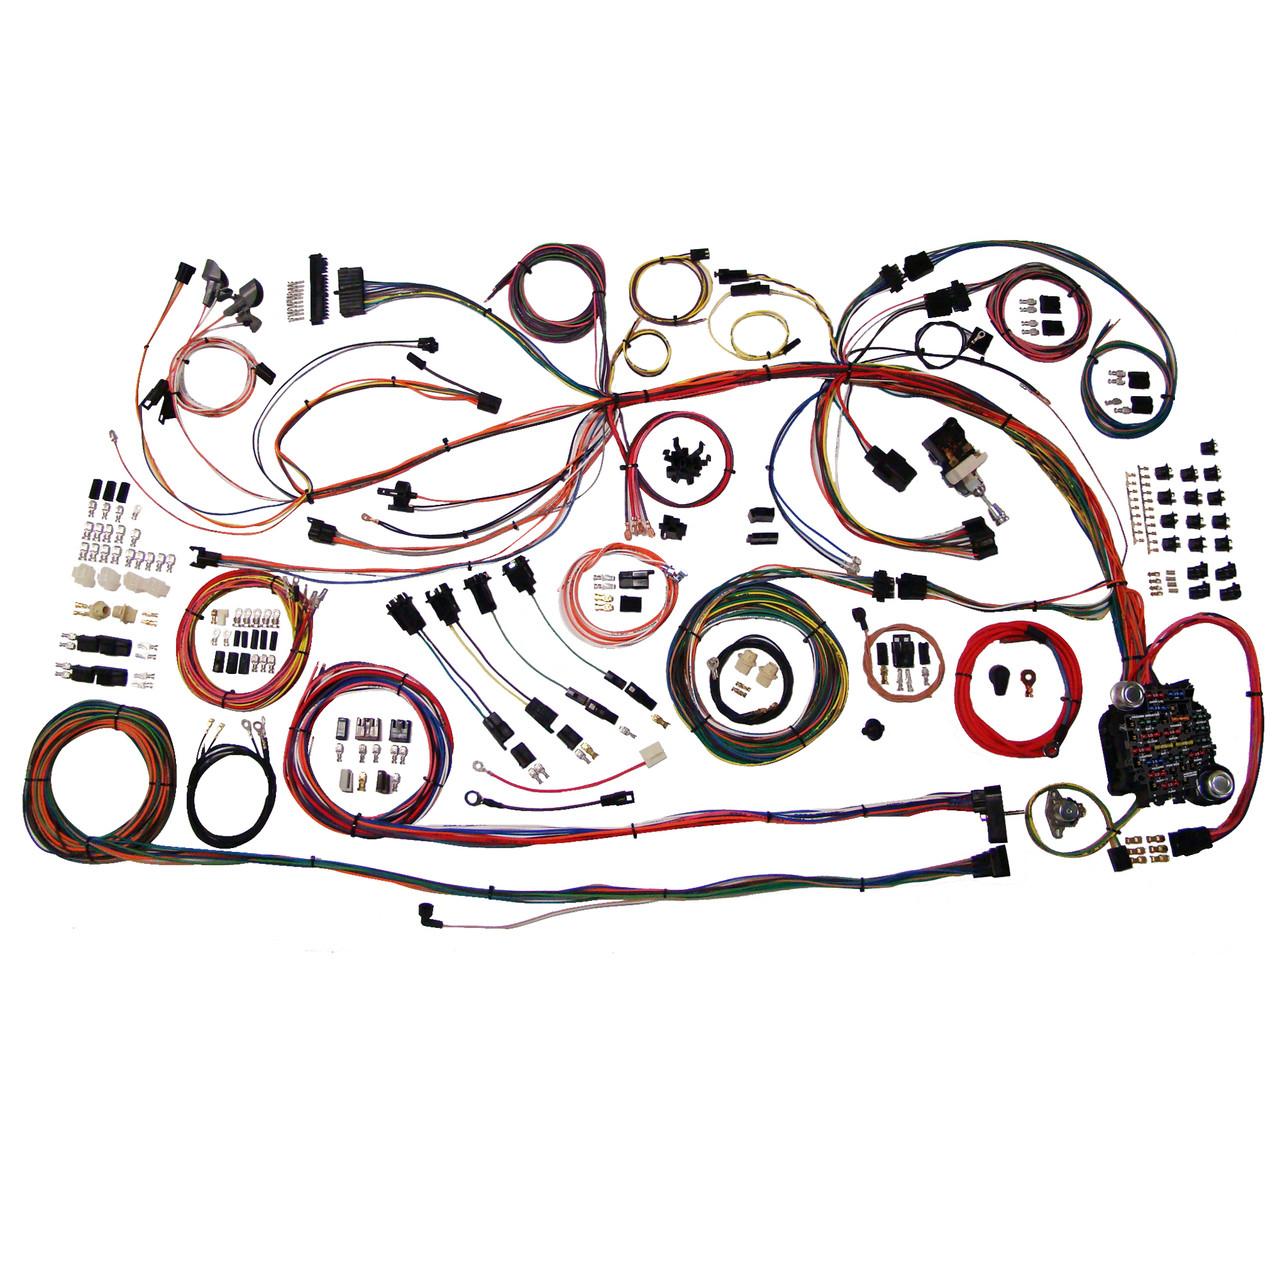 hight resolution of  el camino turn signal wiring diagram on 86 mustang wiring diagram 76 nova wiring diagram